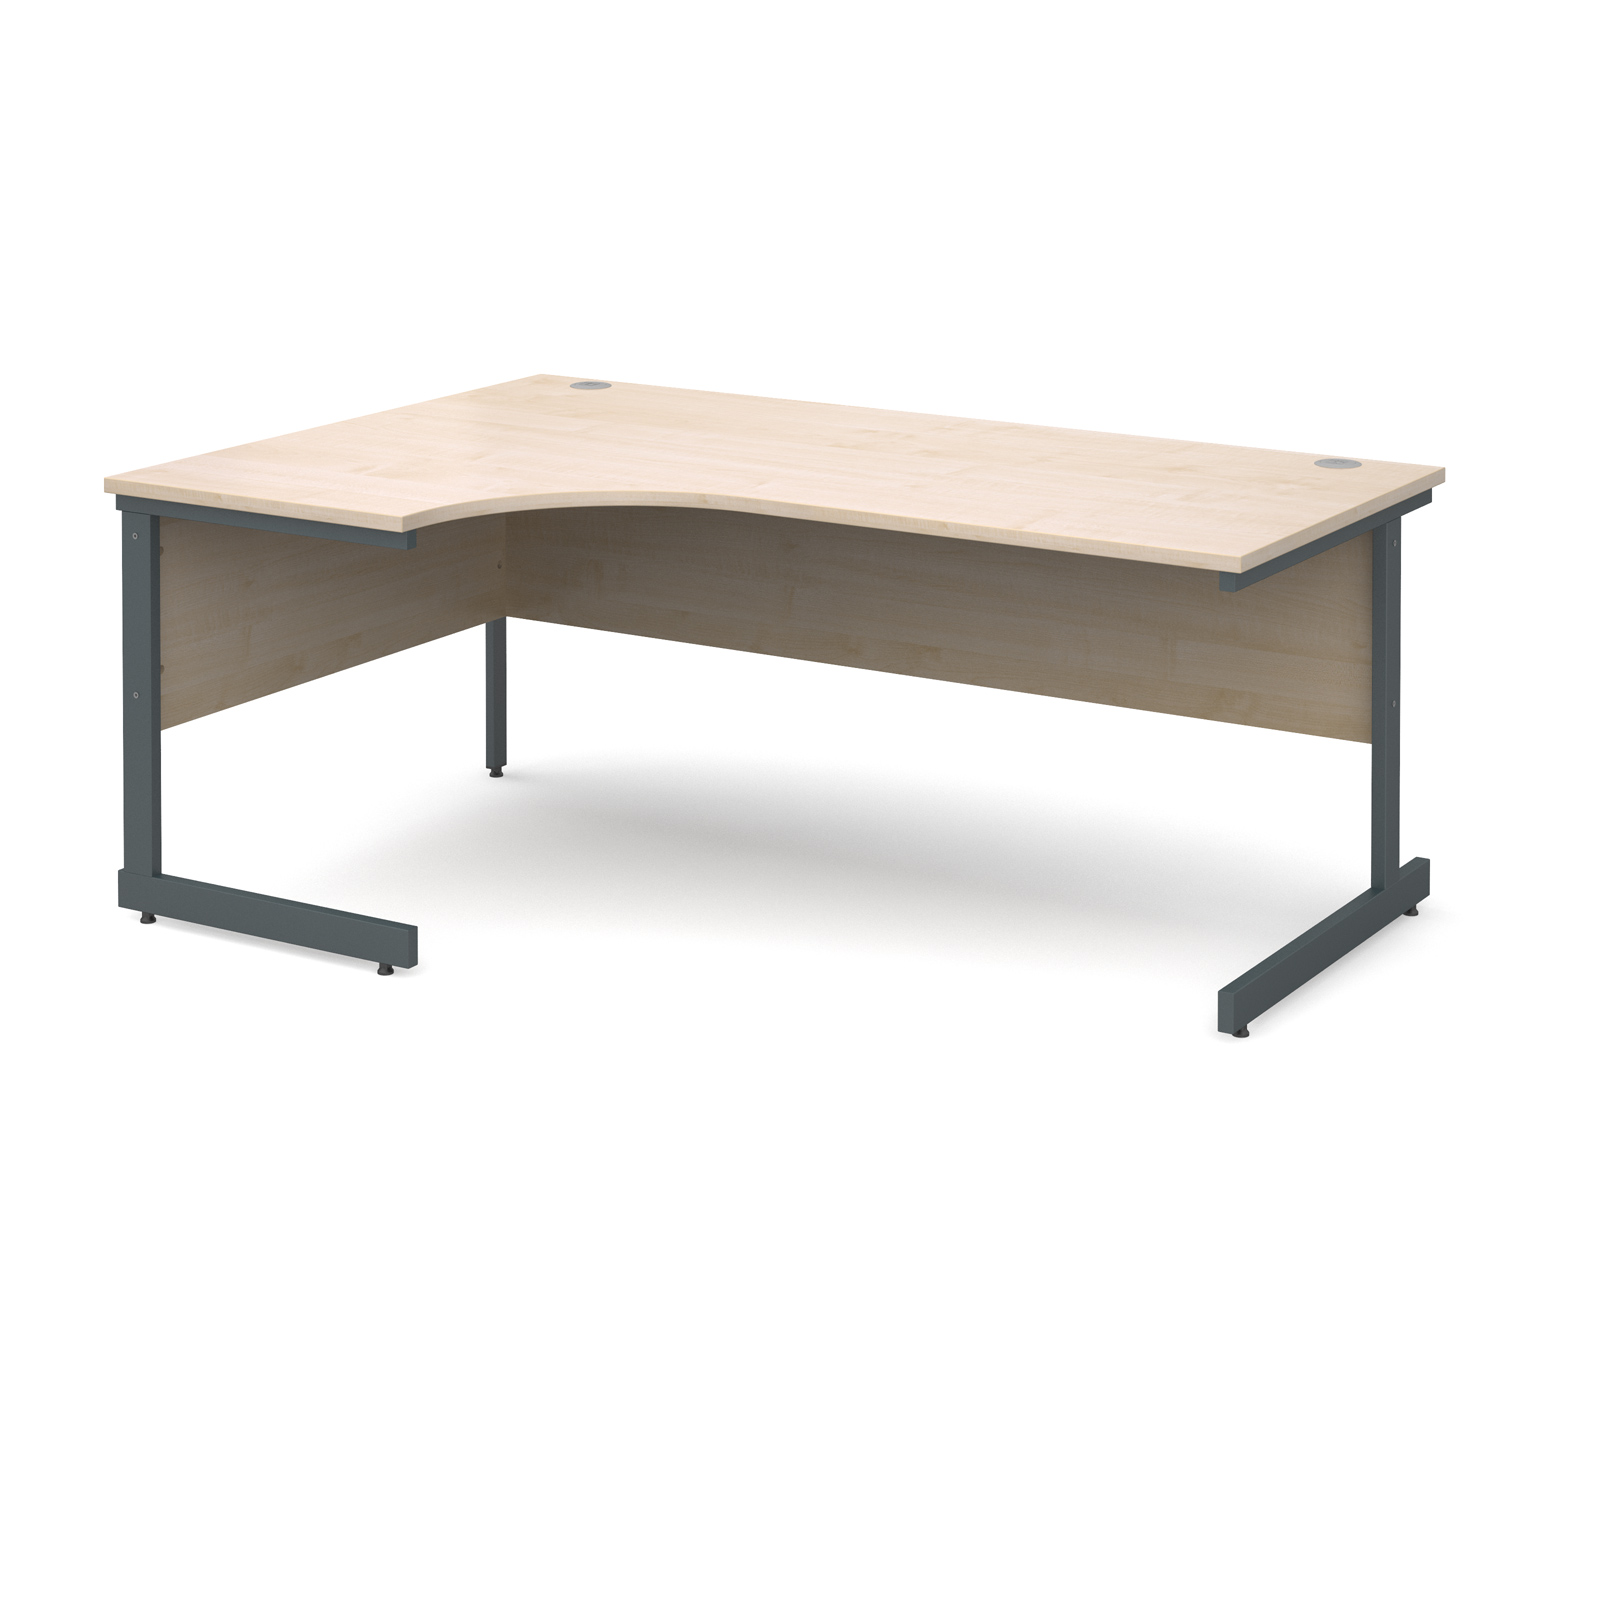 Contract 25 left hand ergonomic desk 1800mm - graphite cantilever frame, maple top